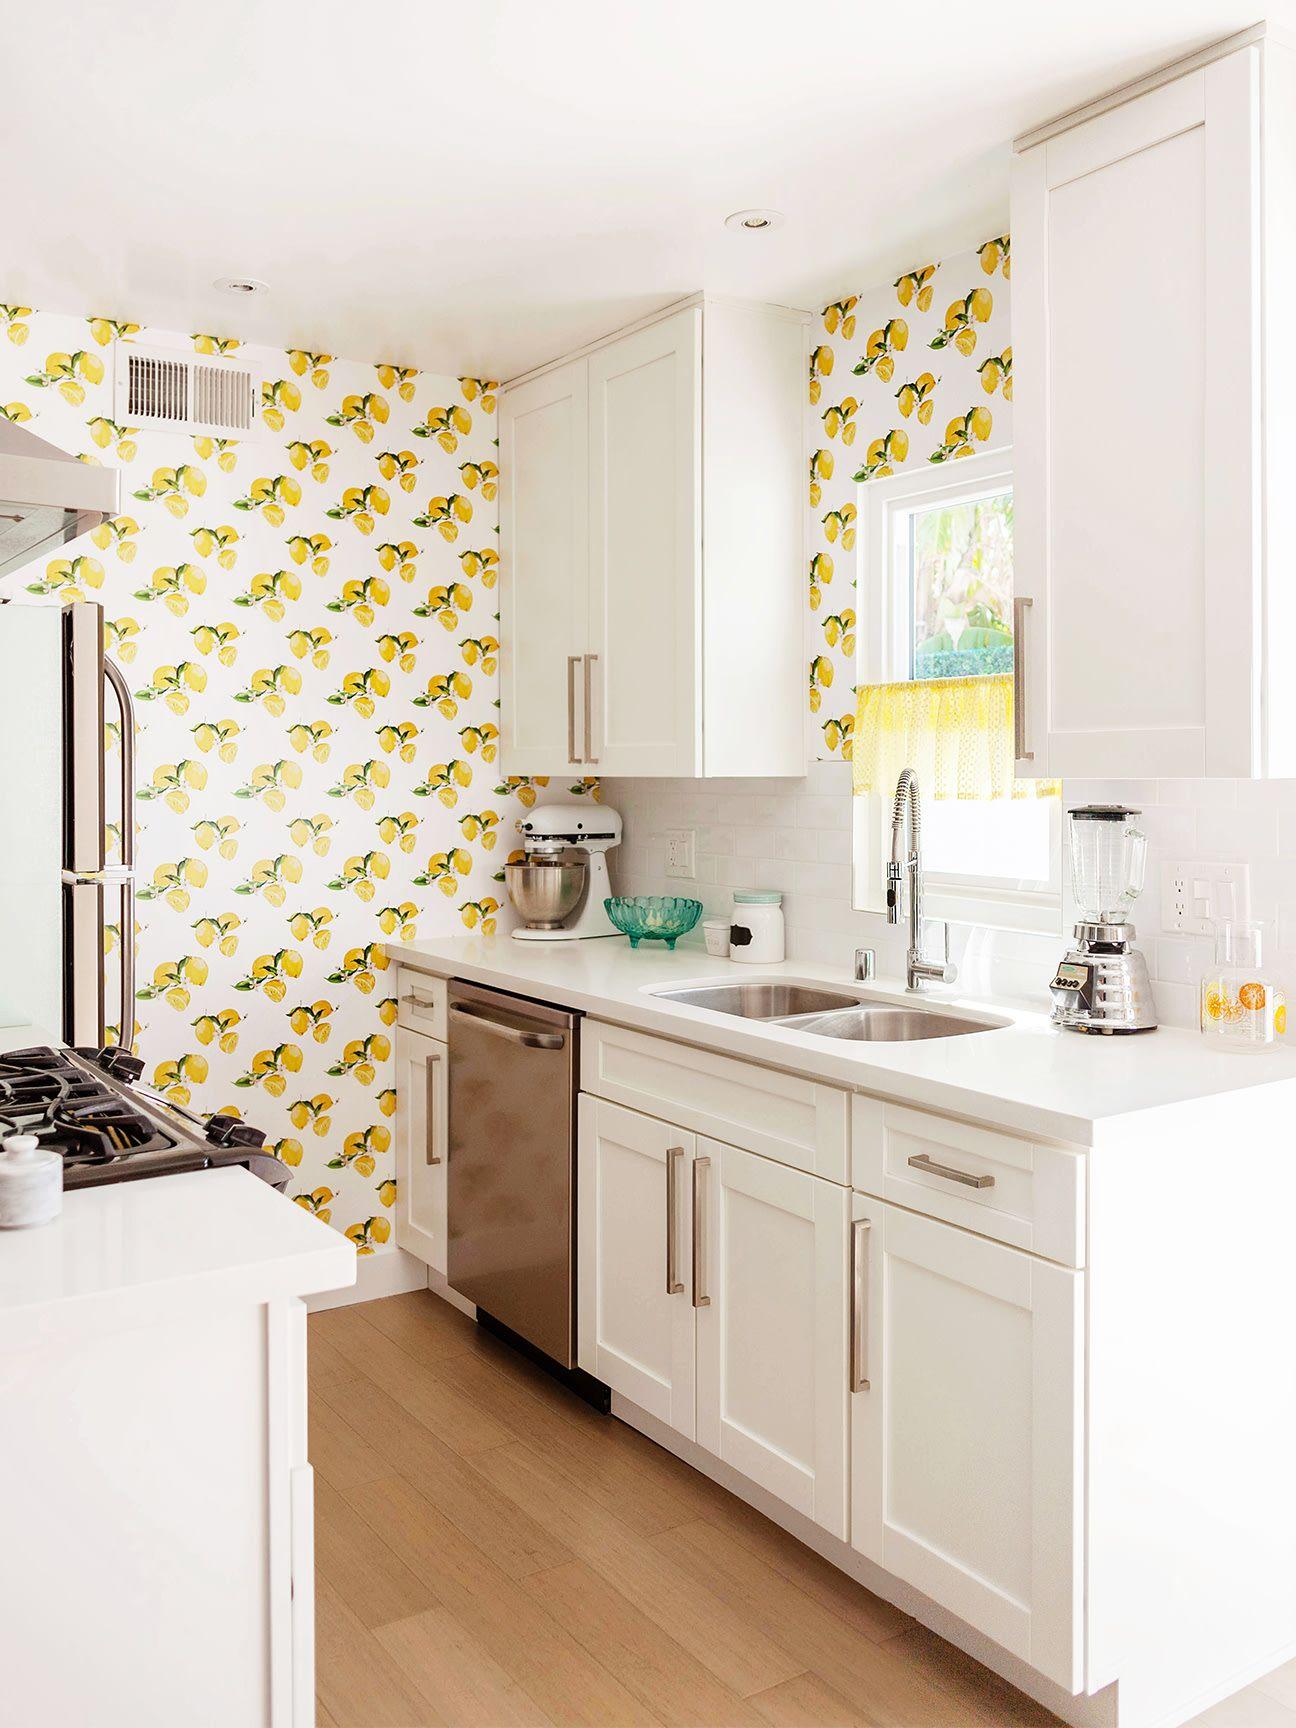 7 Kitchen Wallpaper Ideas That'll Inspire a Bold